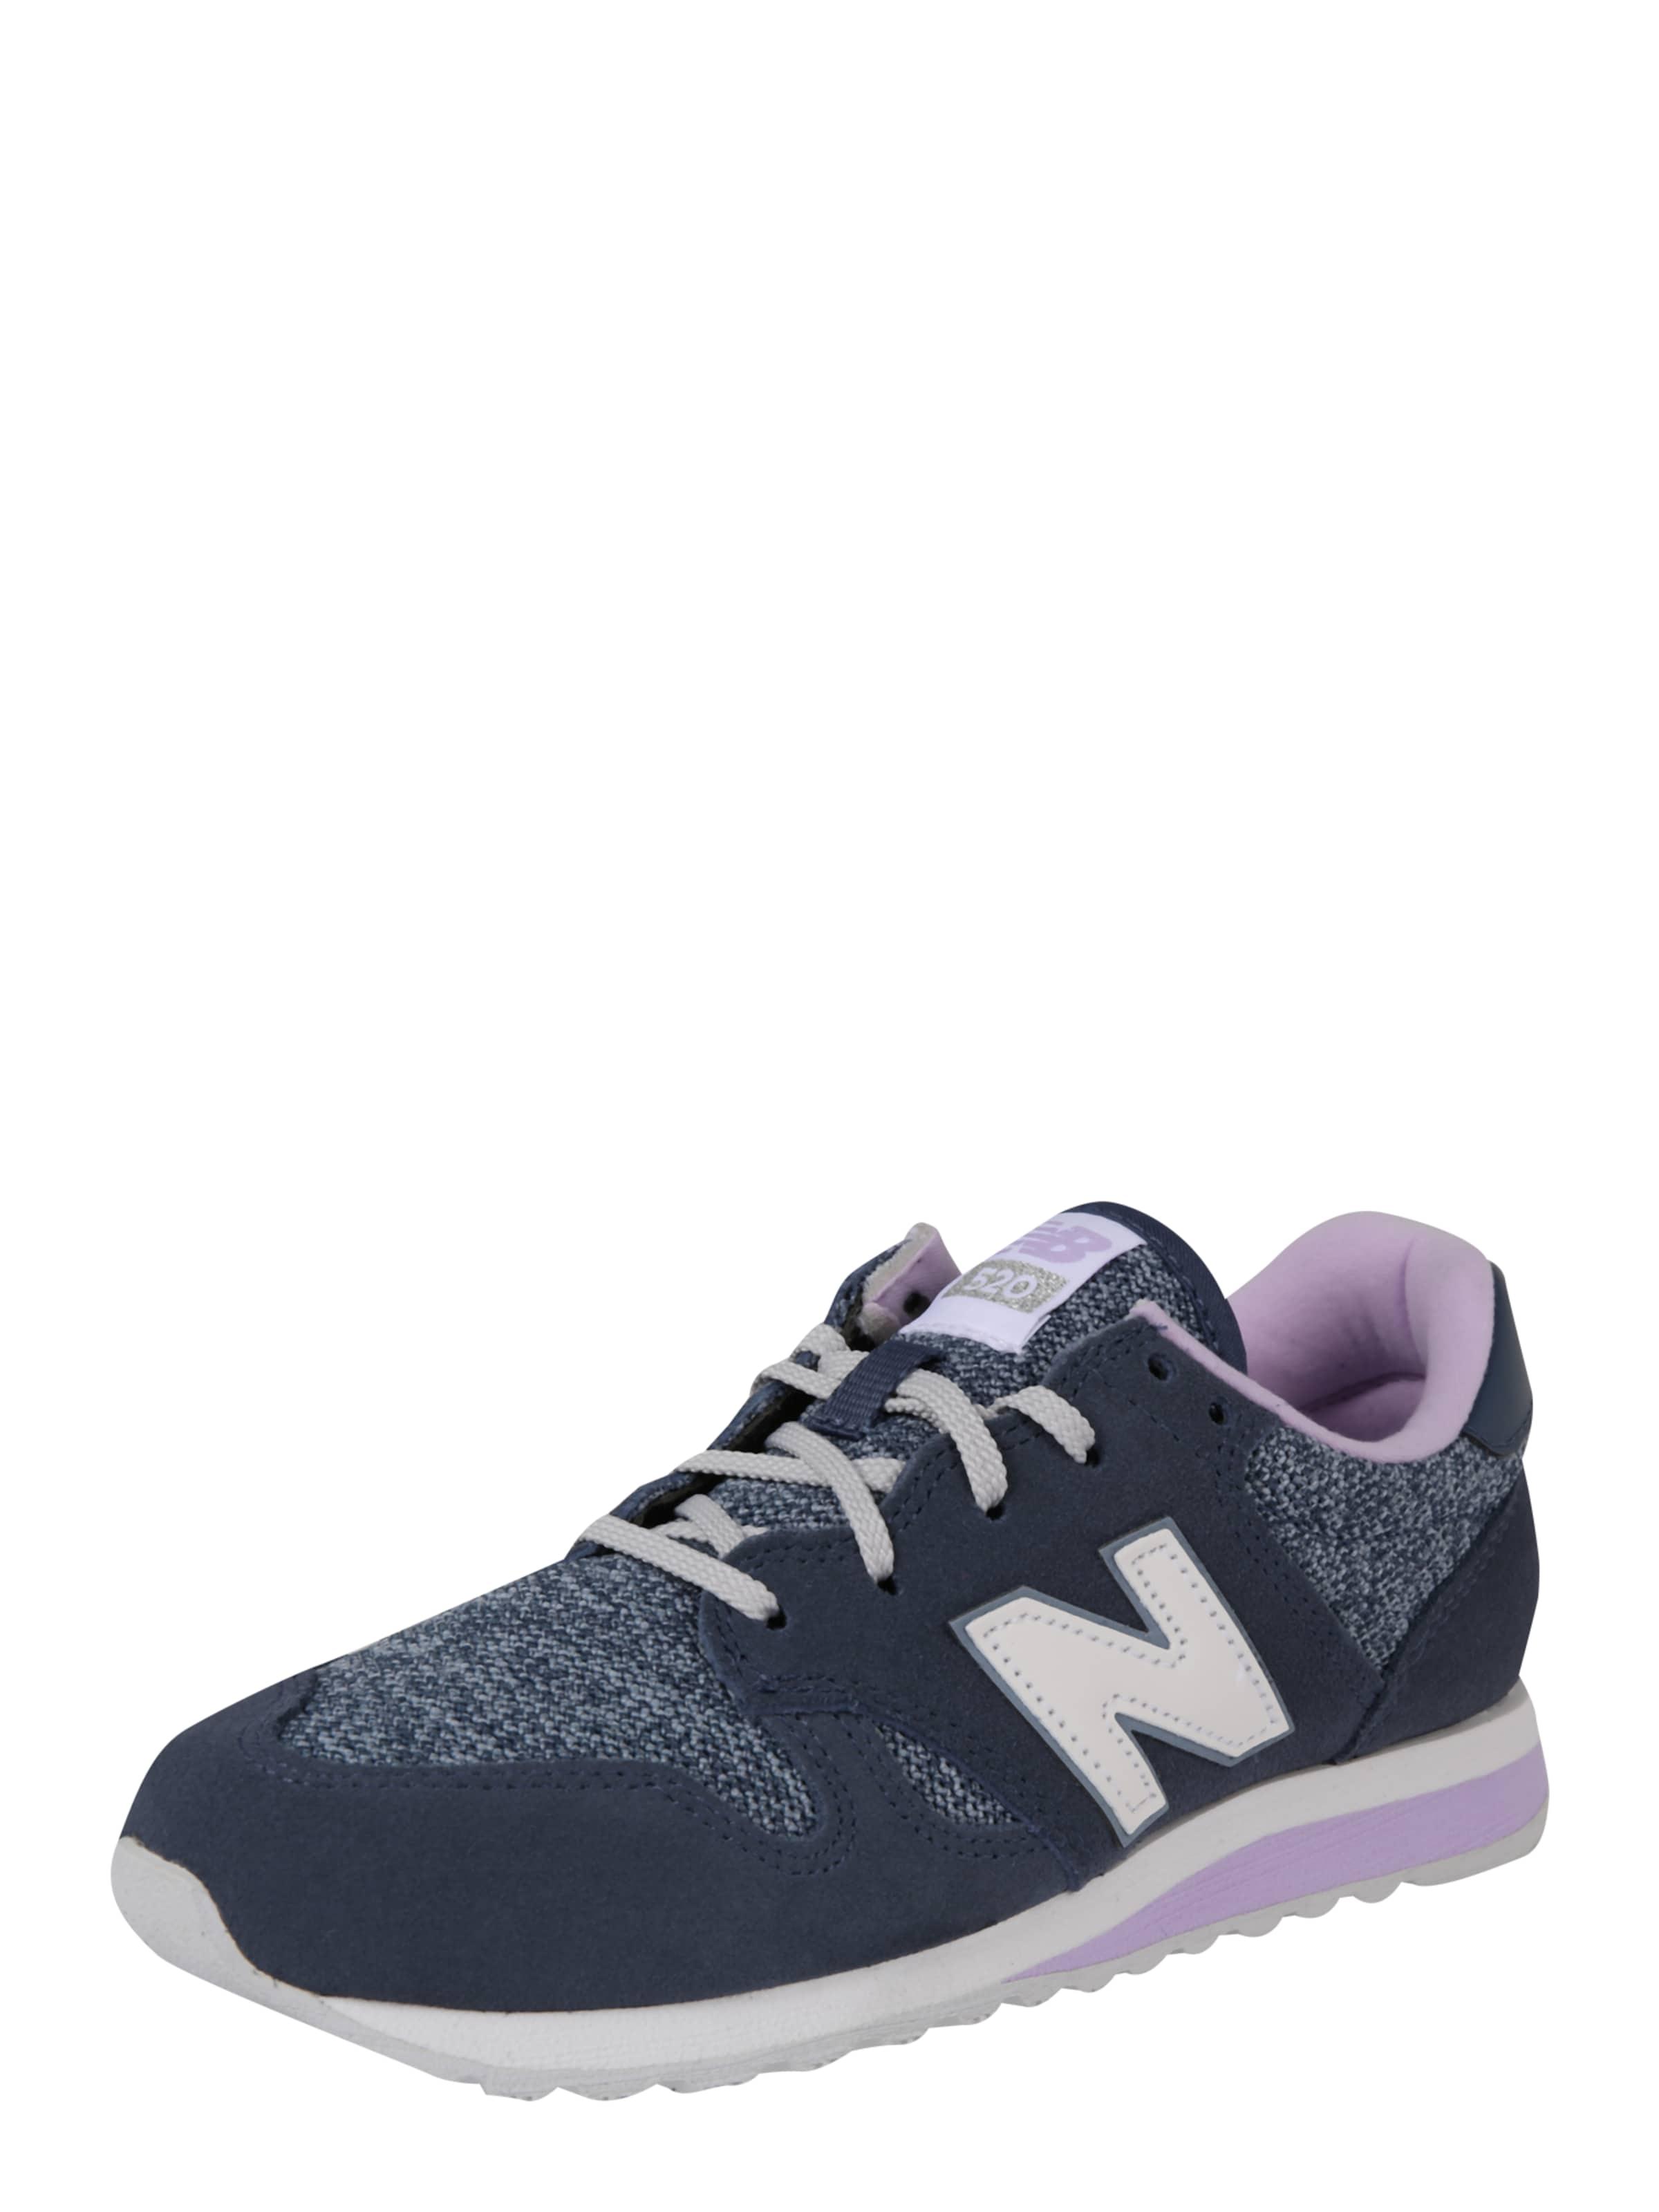 '520' In Balance Weiß New Sneaker MarinePastellblau iXTkZwOPu